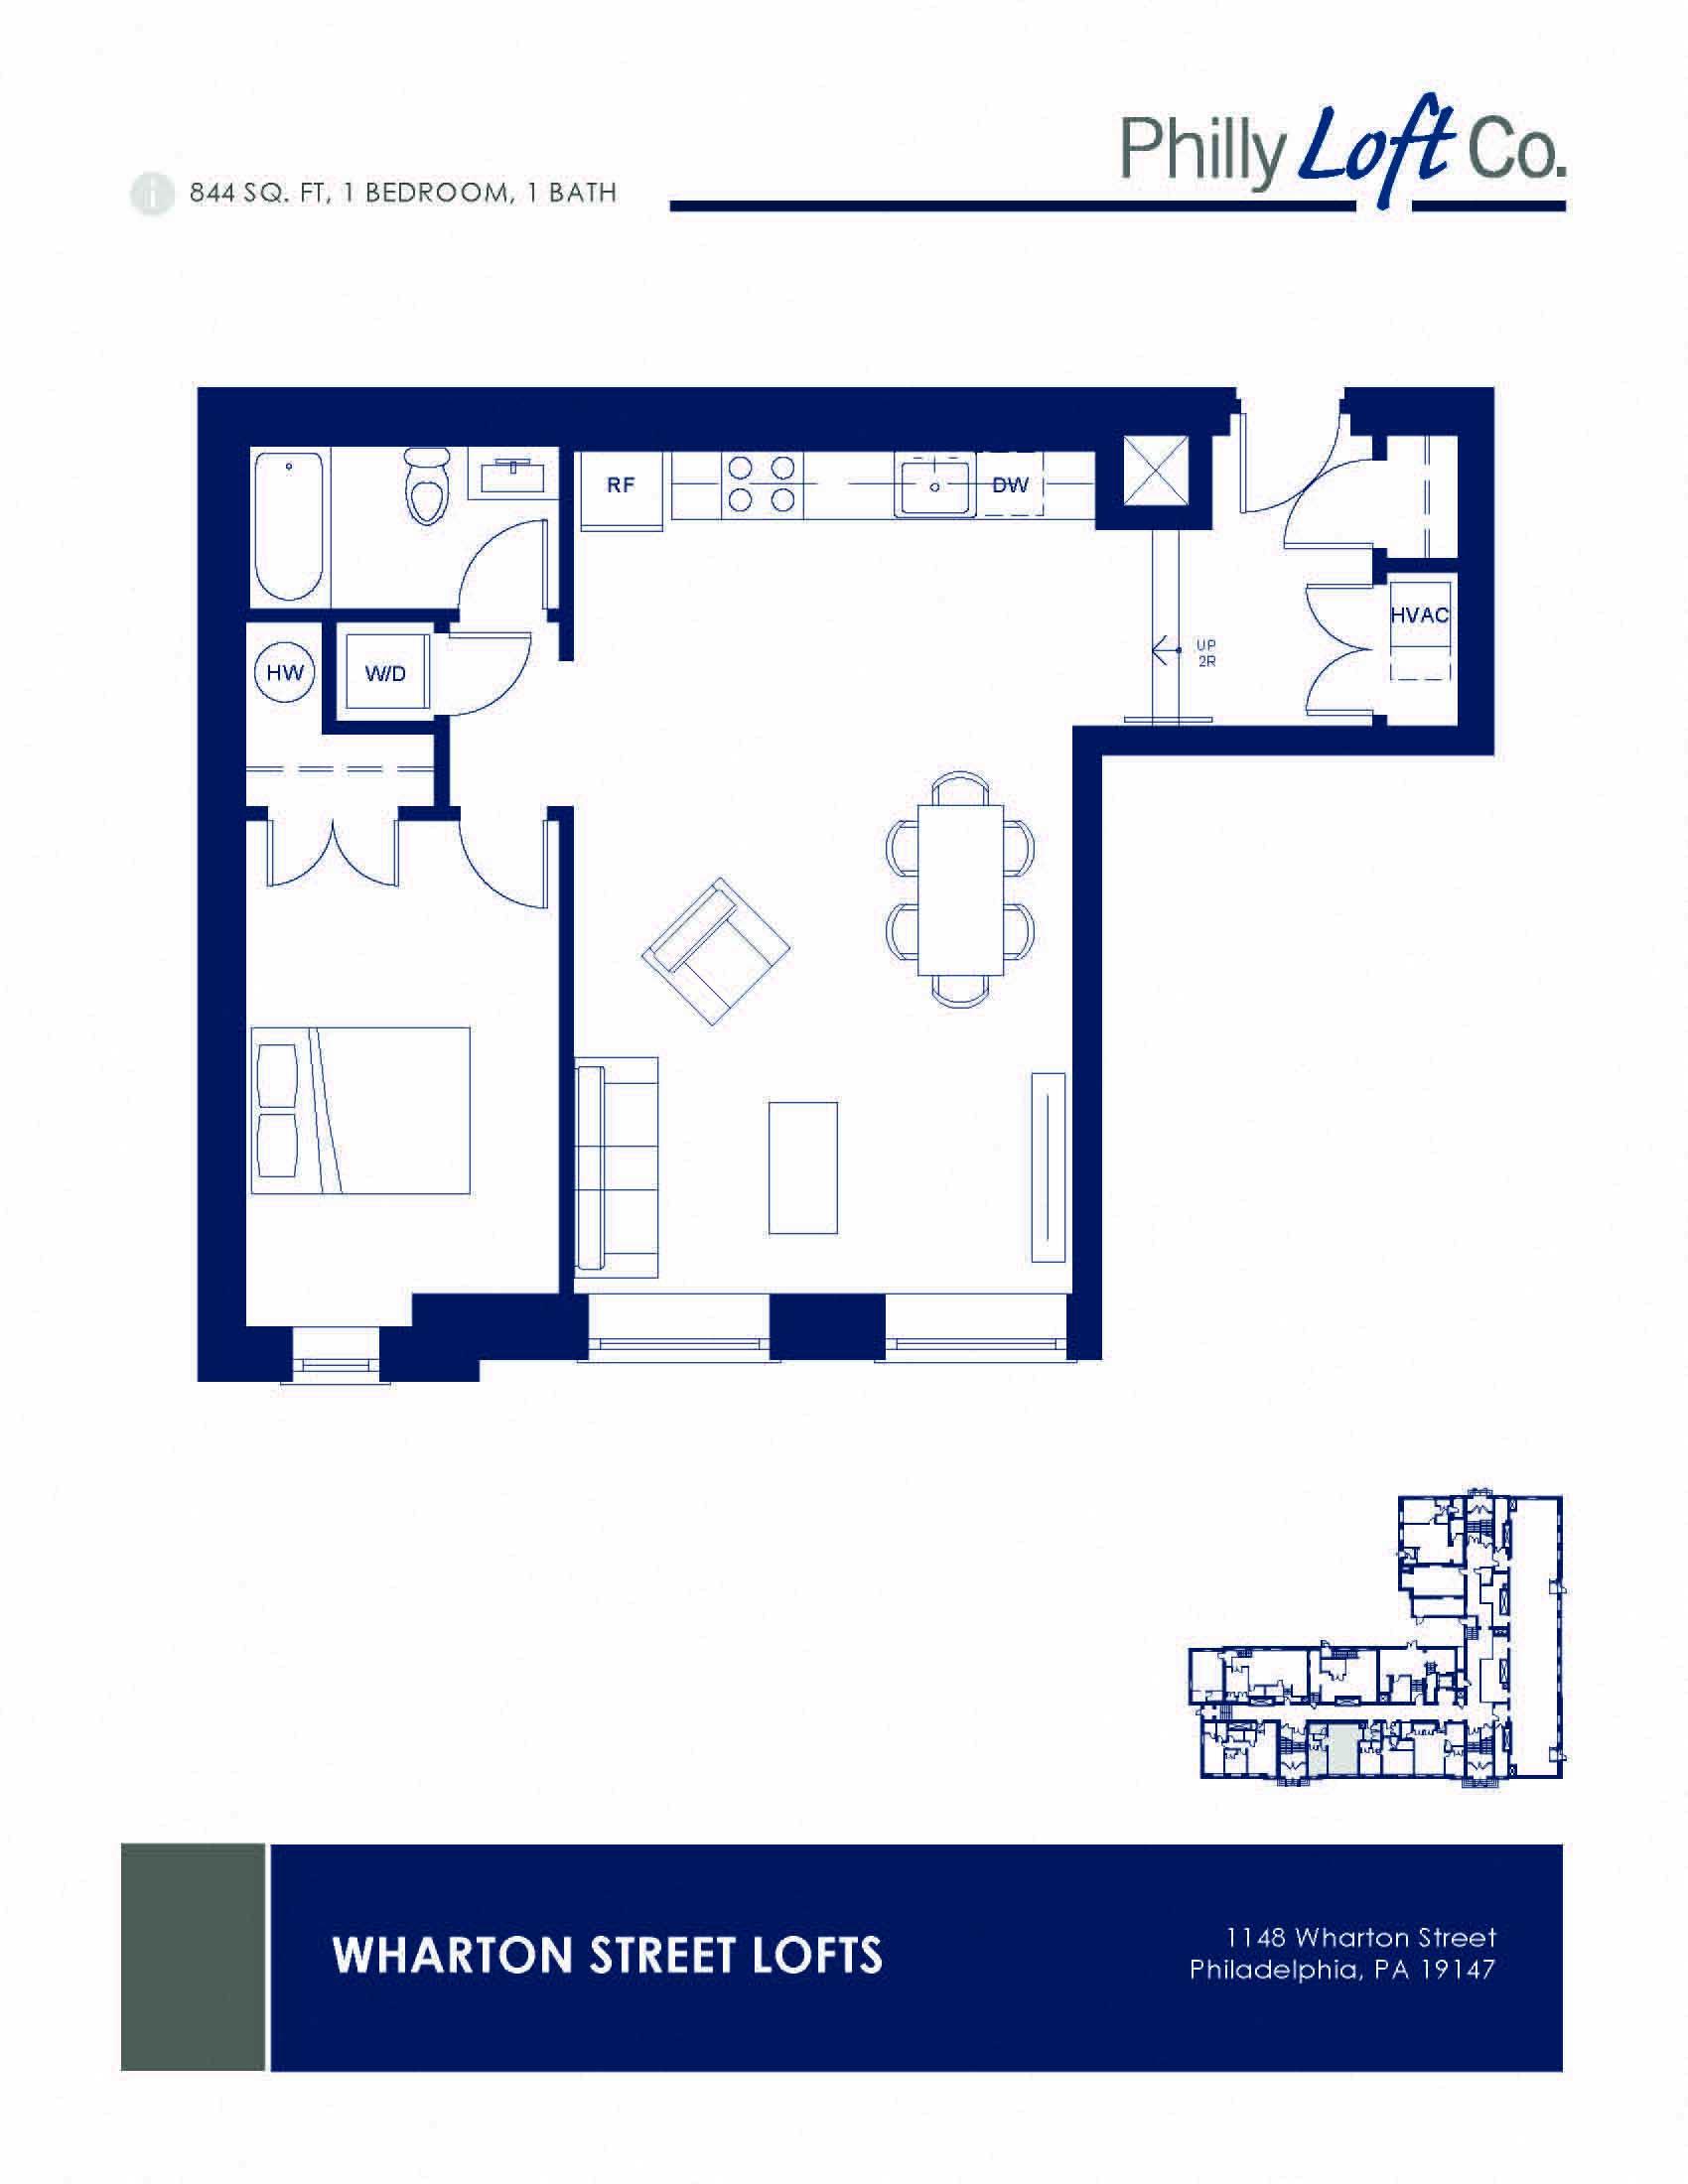 Wharton Street Lofts Floor Plans